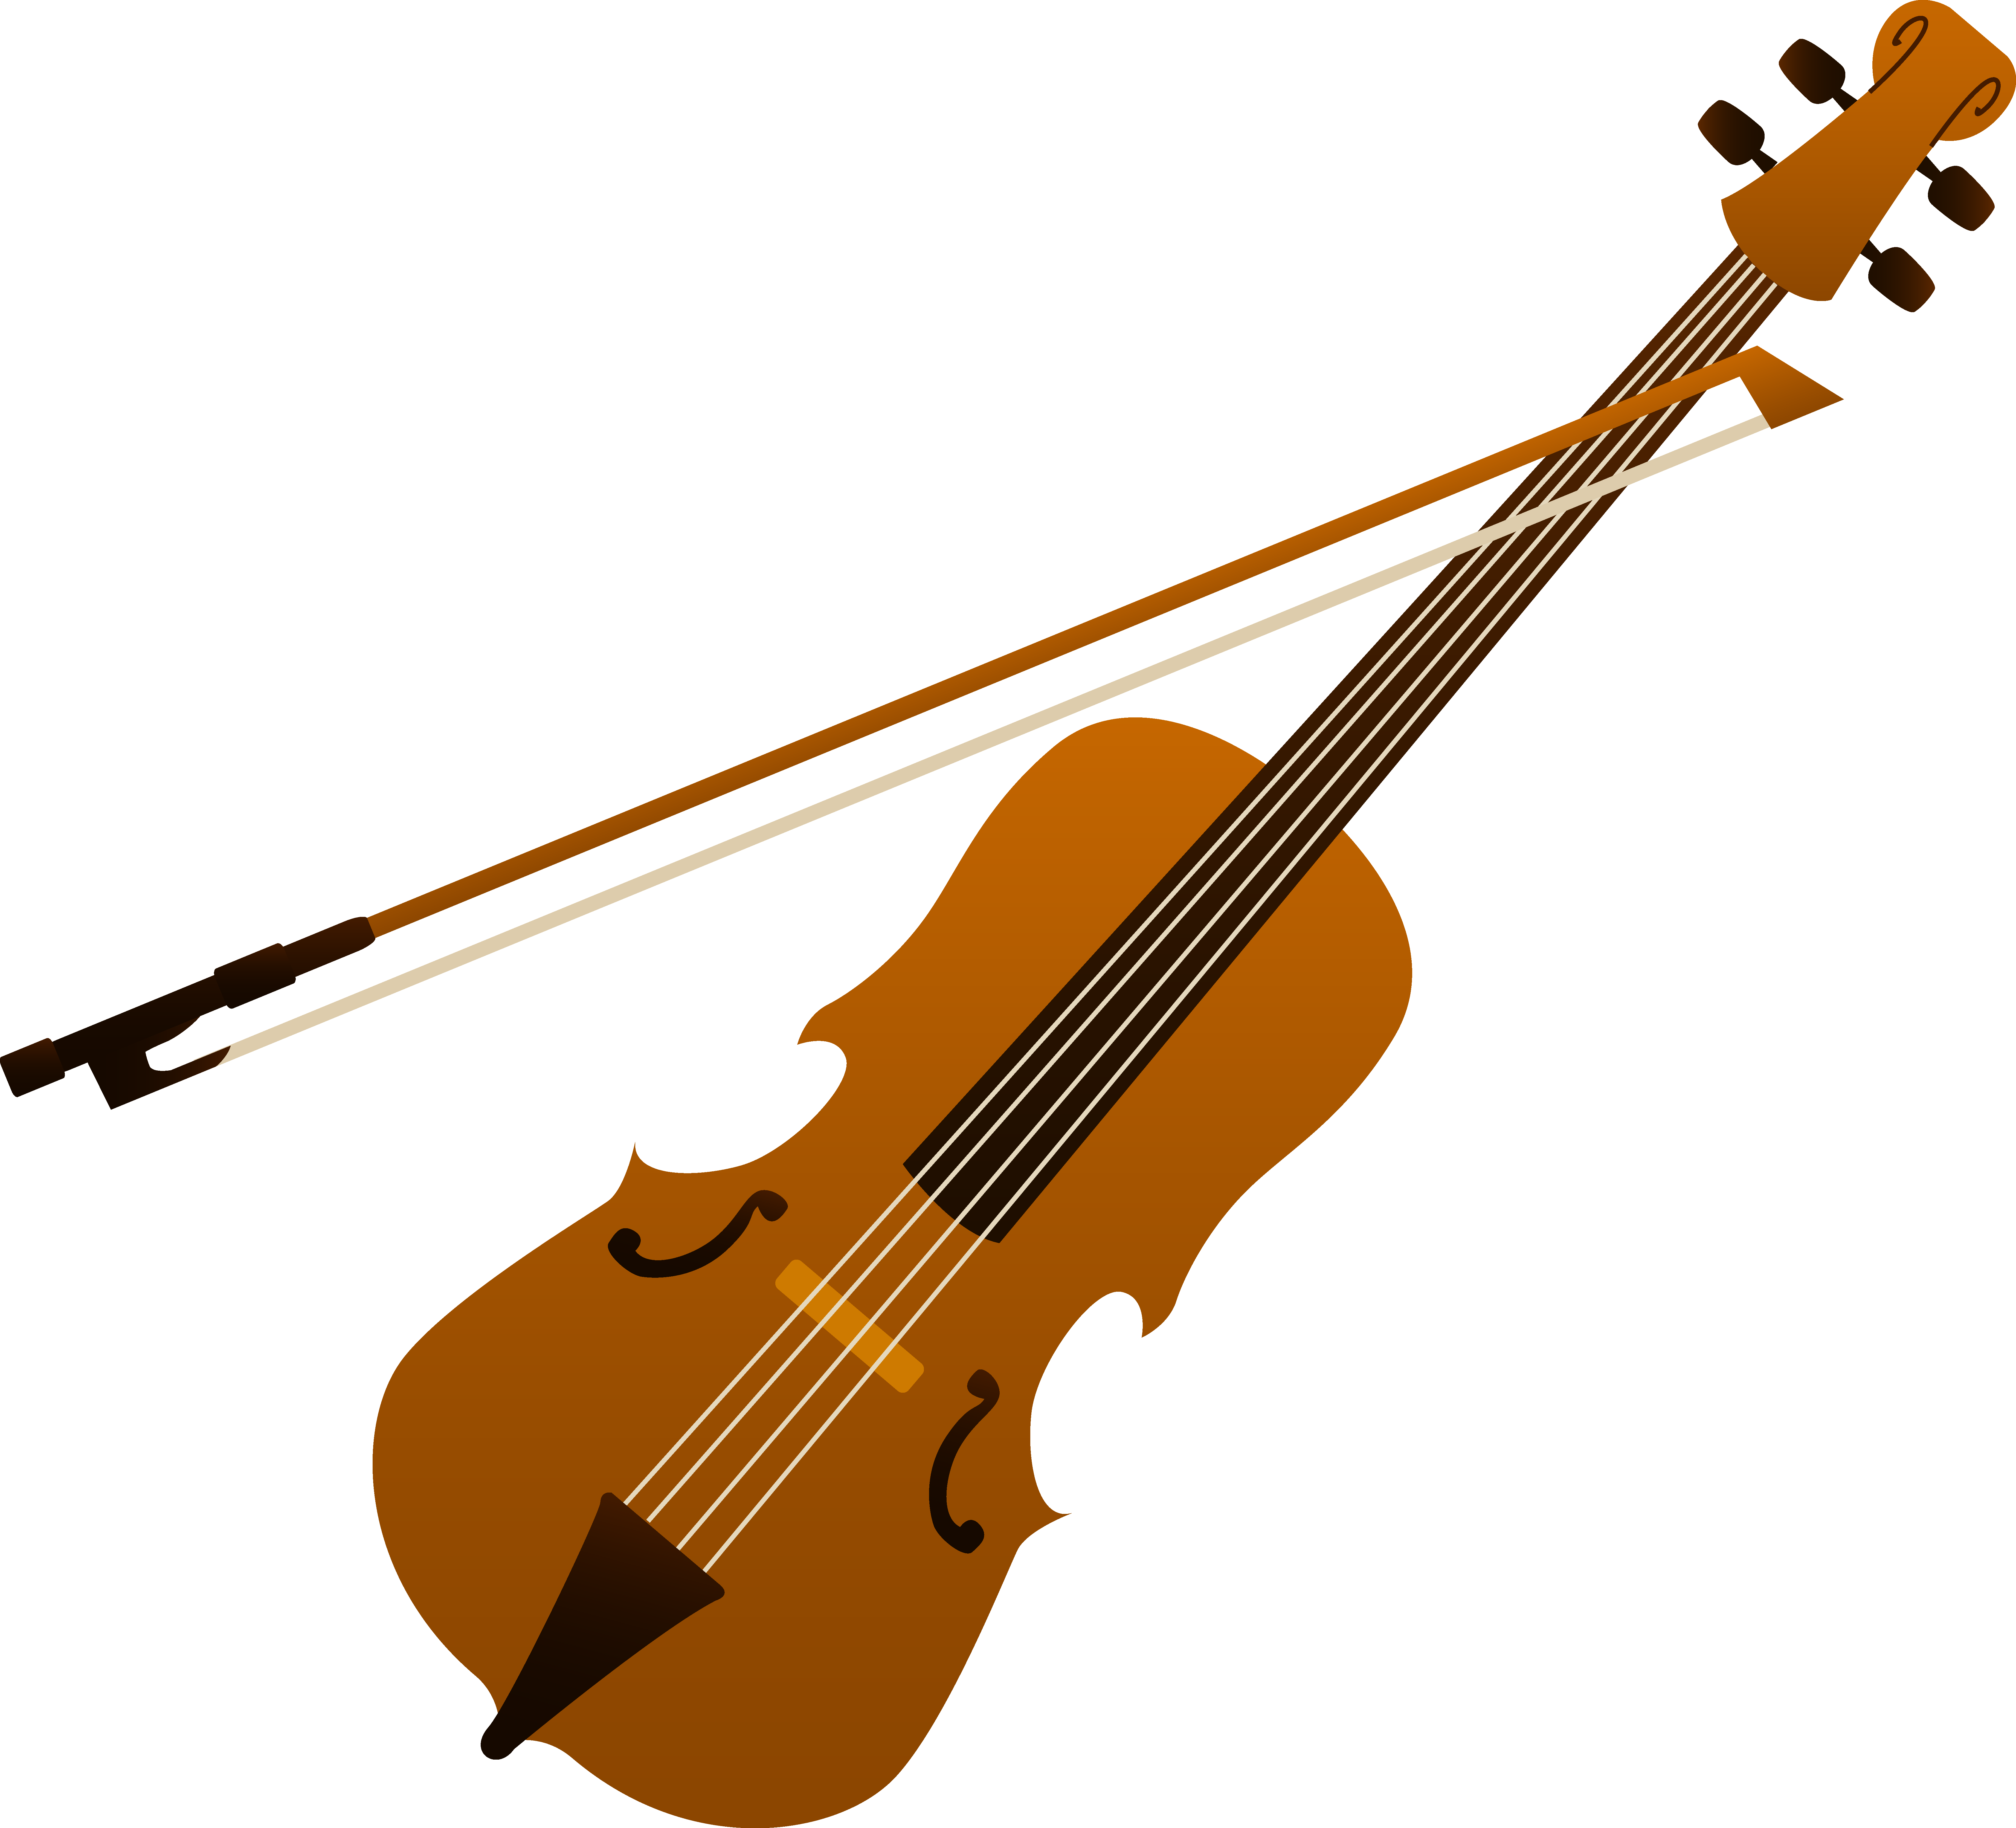 Clipart student orchestra. Ktnaogxgc png random pinterest